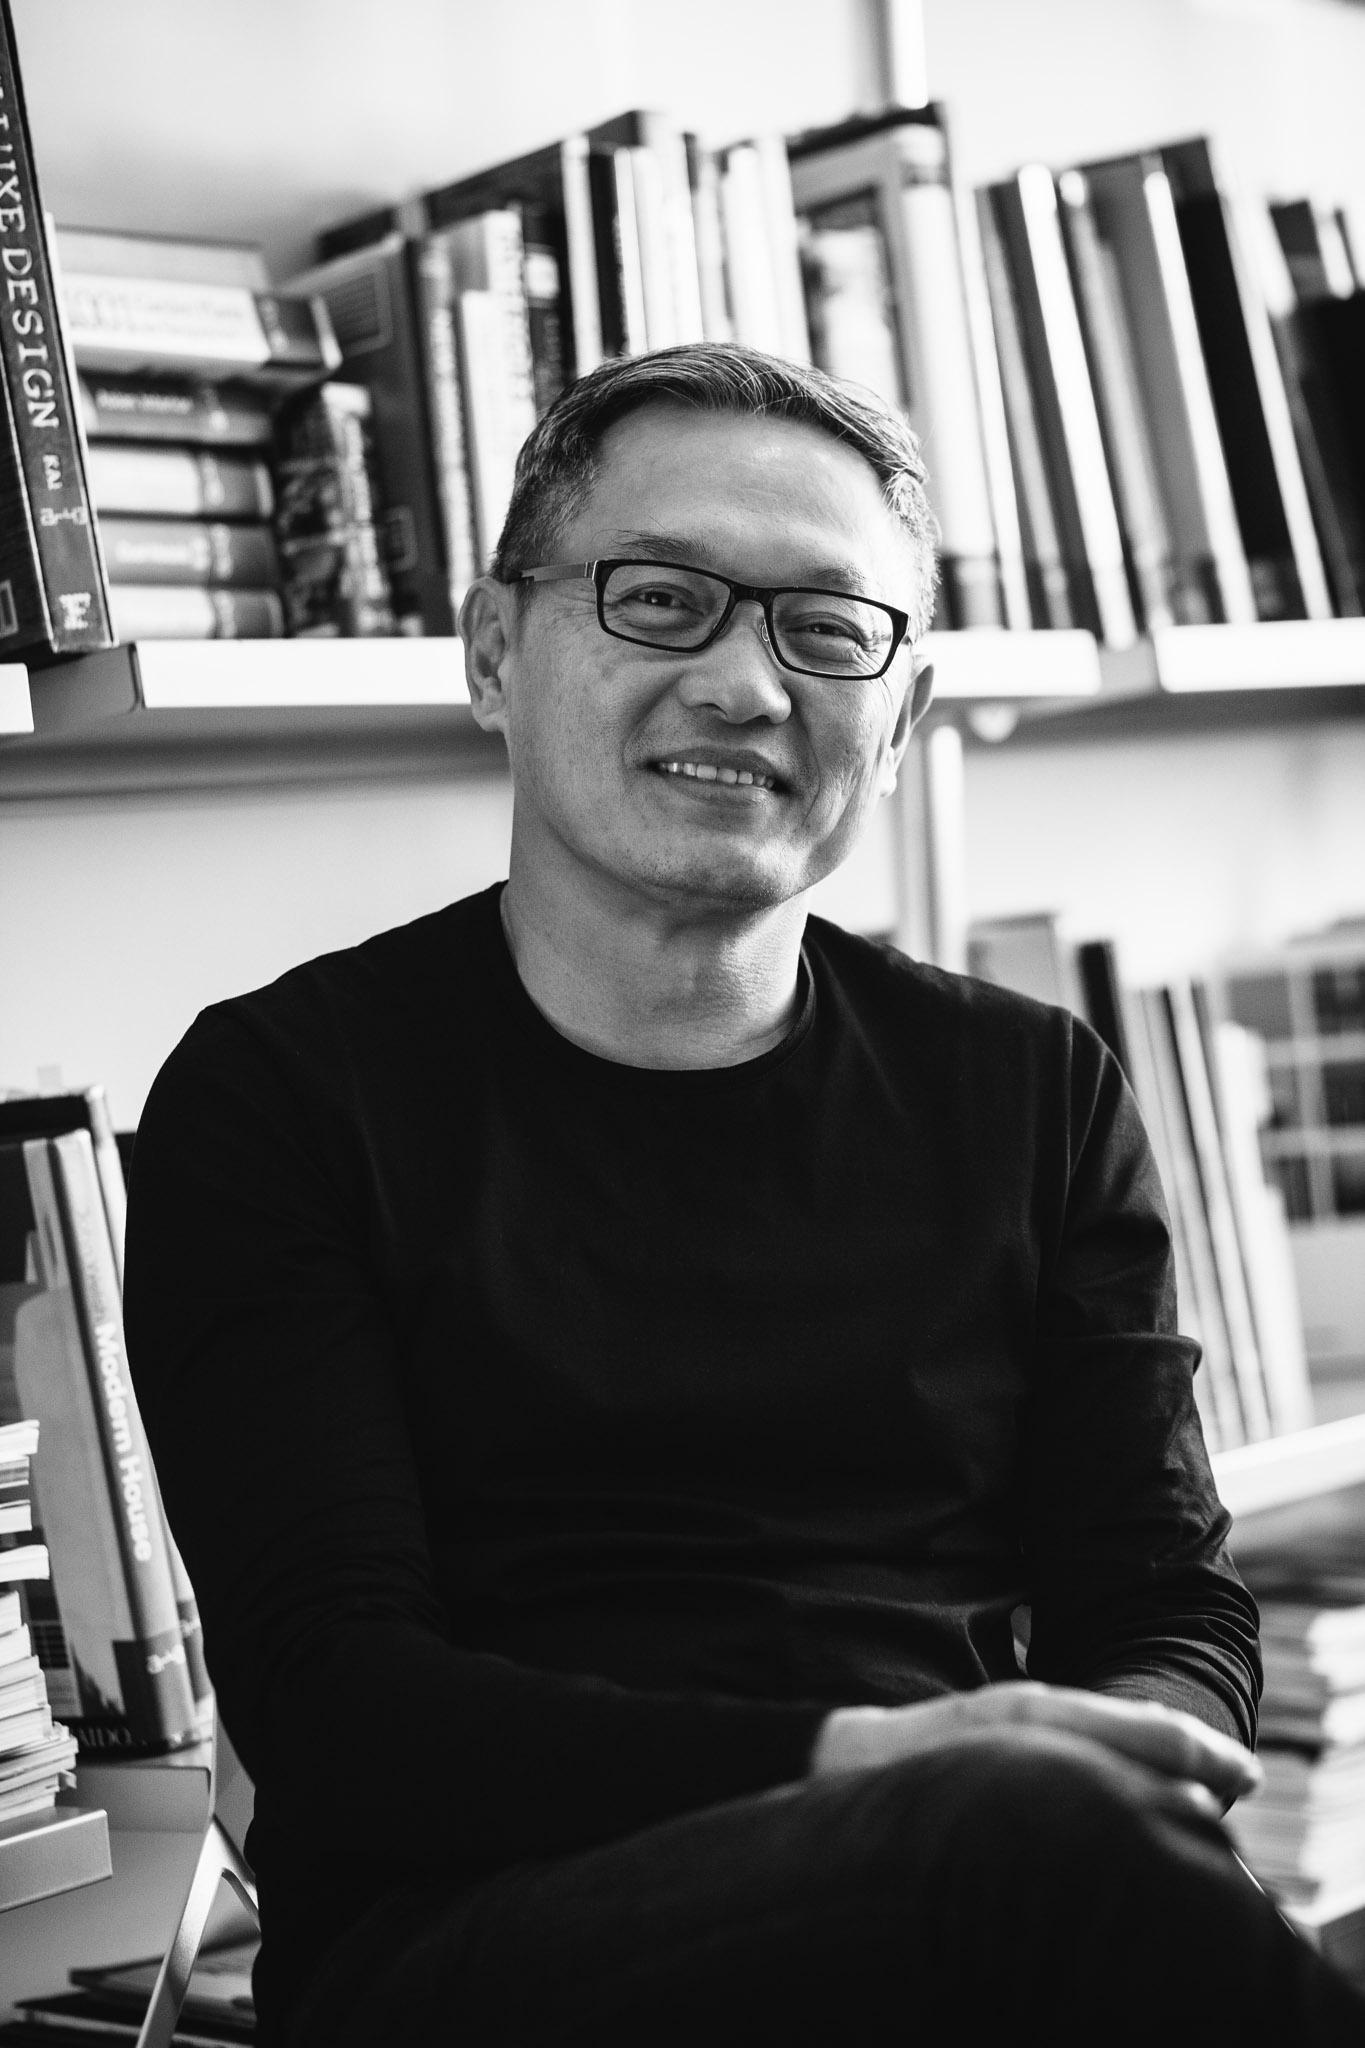 singapore-commercial-editorial-photographer-portraiture-architect-lim-cheng-kooi-AR43-zakaria-zainal-04.jpg